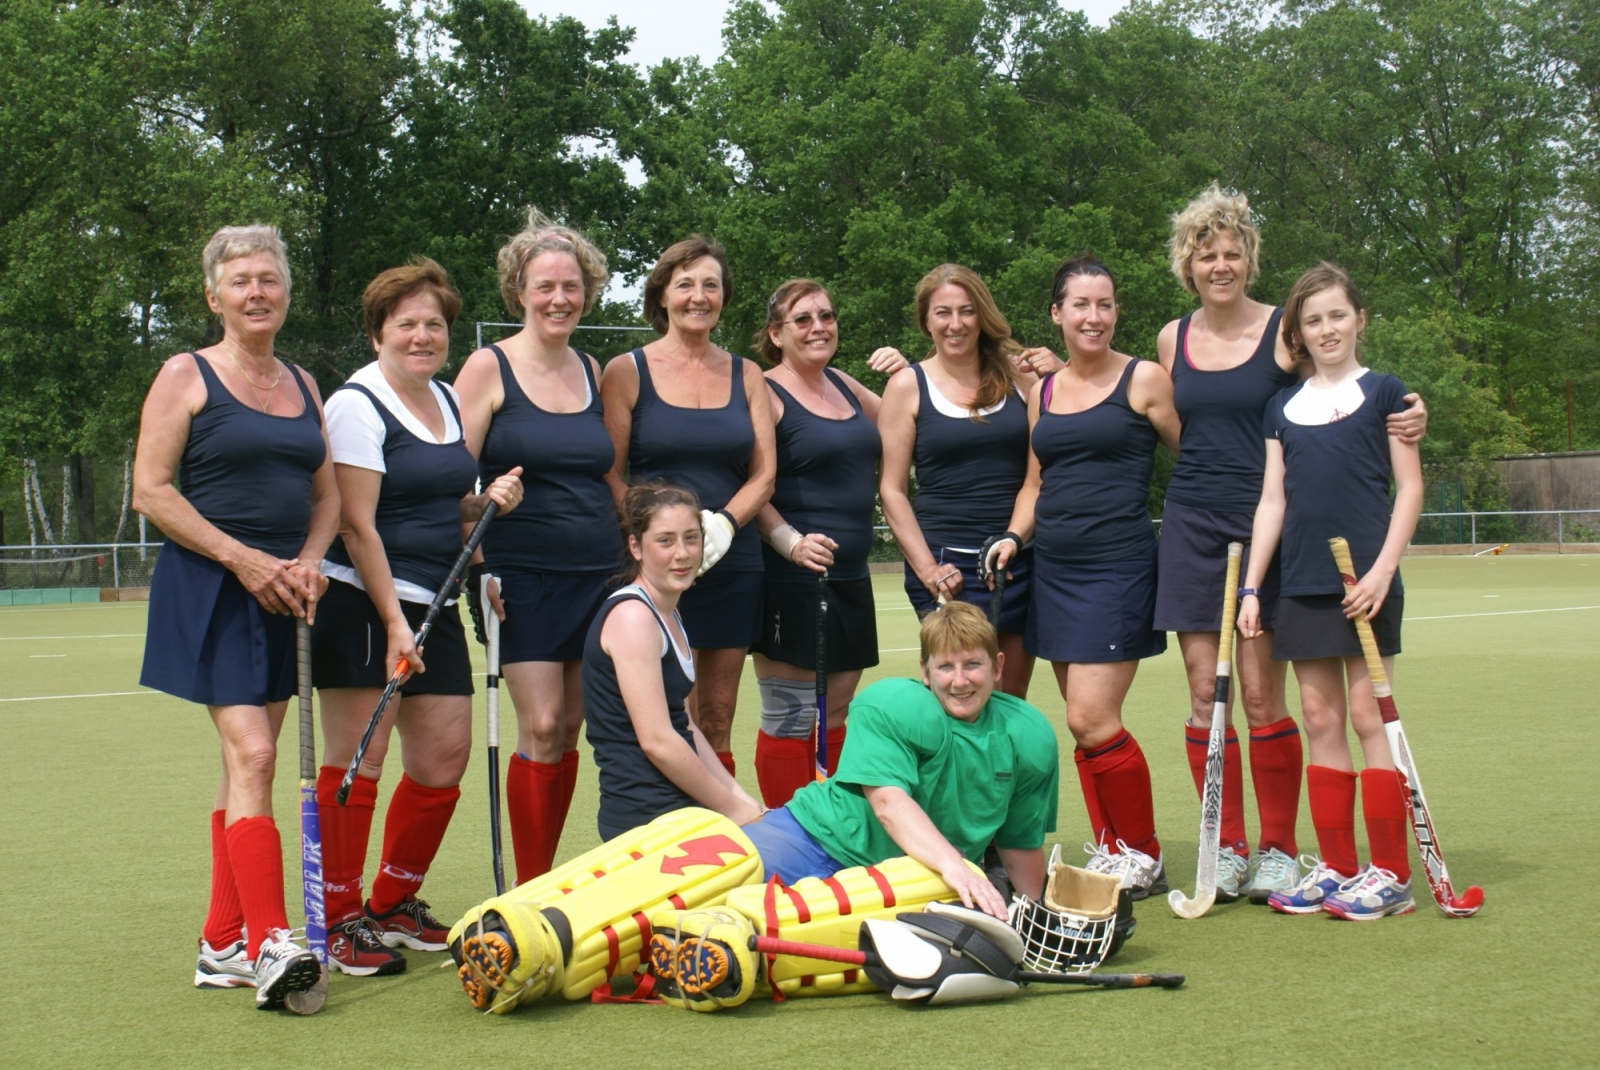 European mami 39 s hockey festival desde leuven b lgica las chicas de oro - Las chicas de oro espana ...